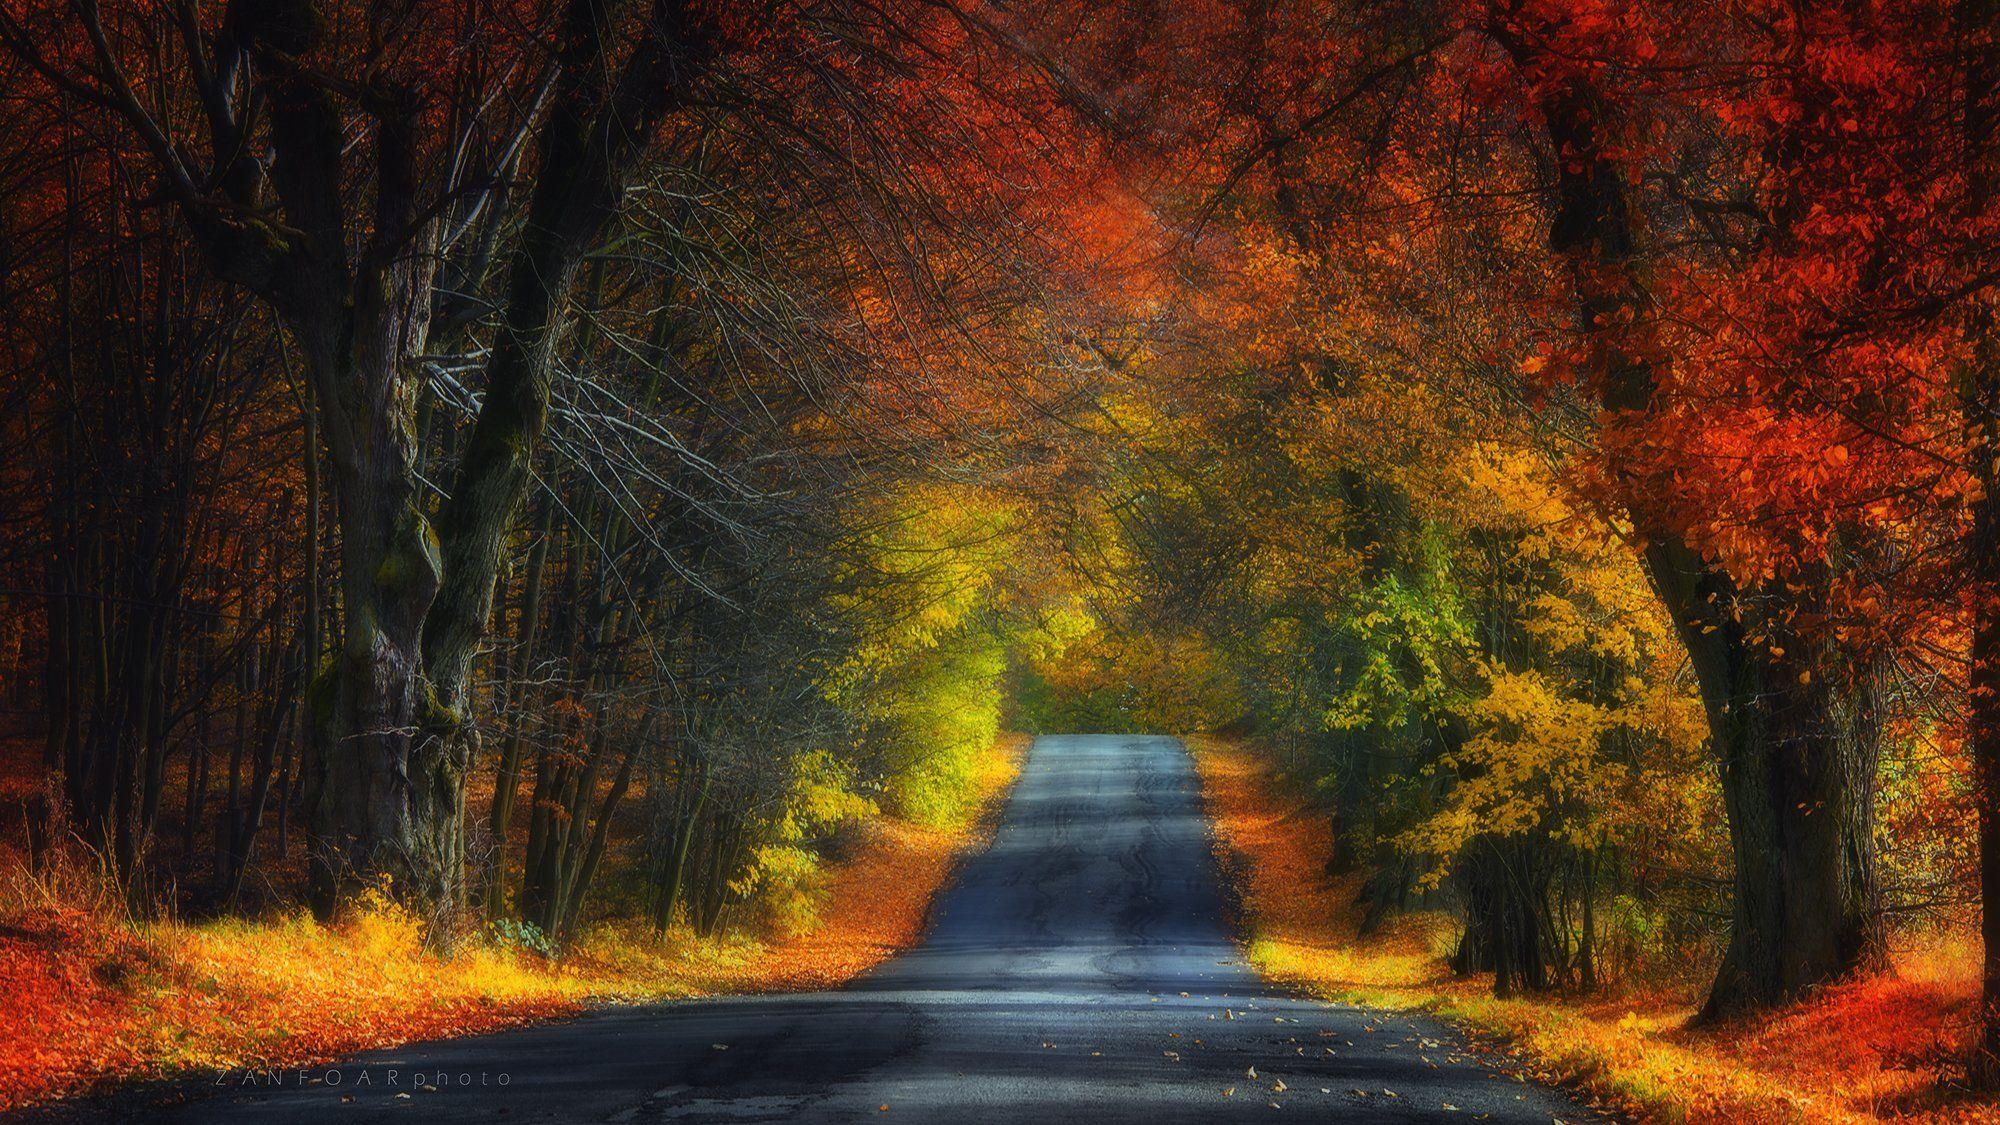 осень, цвета, аллея, путь, деревья, перспектива, zanfoar, никон, чешская республика, Zanfoar